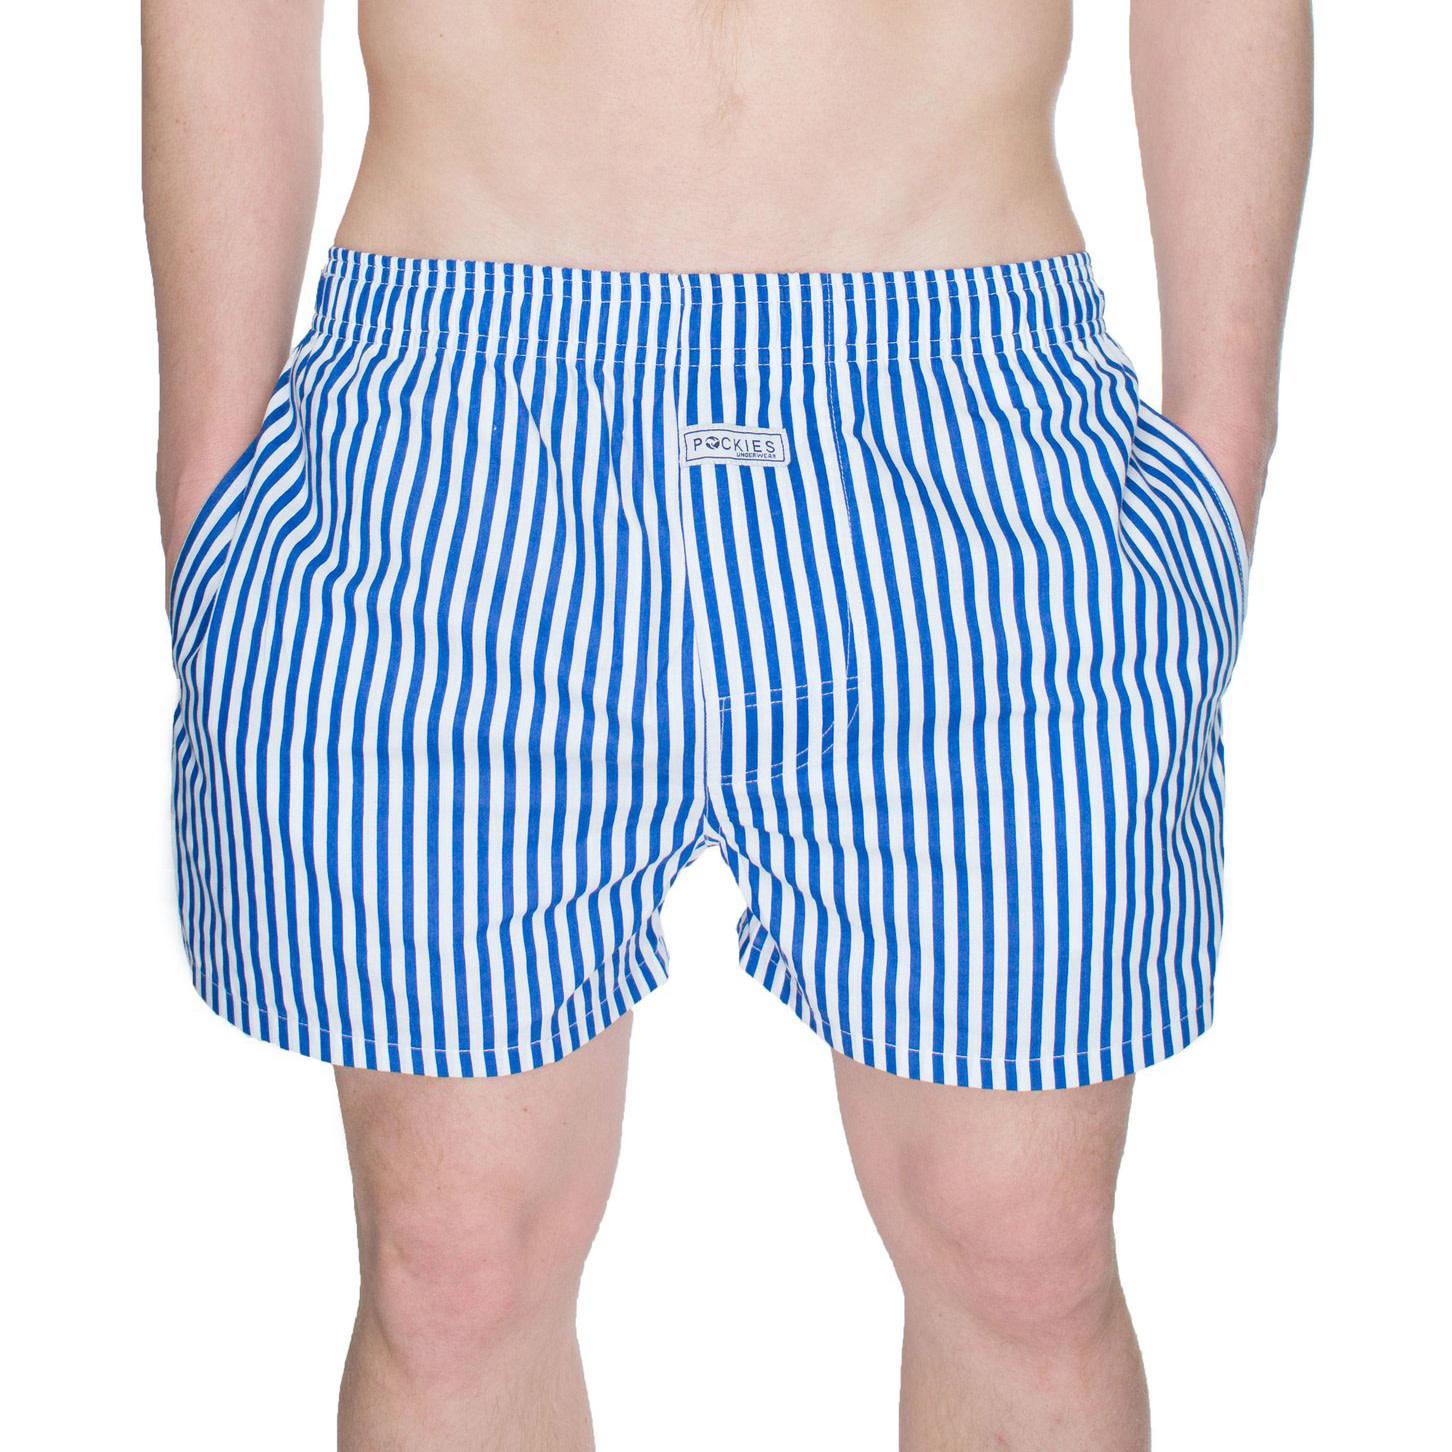 Pockies Pockies Navy Stripes